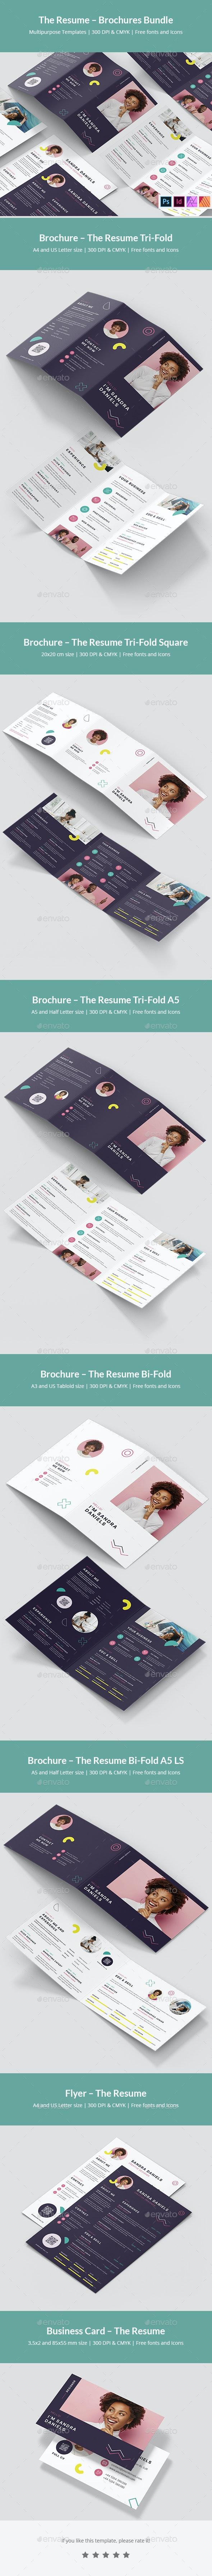 The Resume – Brochures Bundle Print Templates 7 in 1 - Informational Brochures